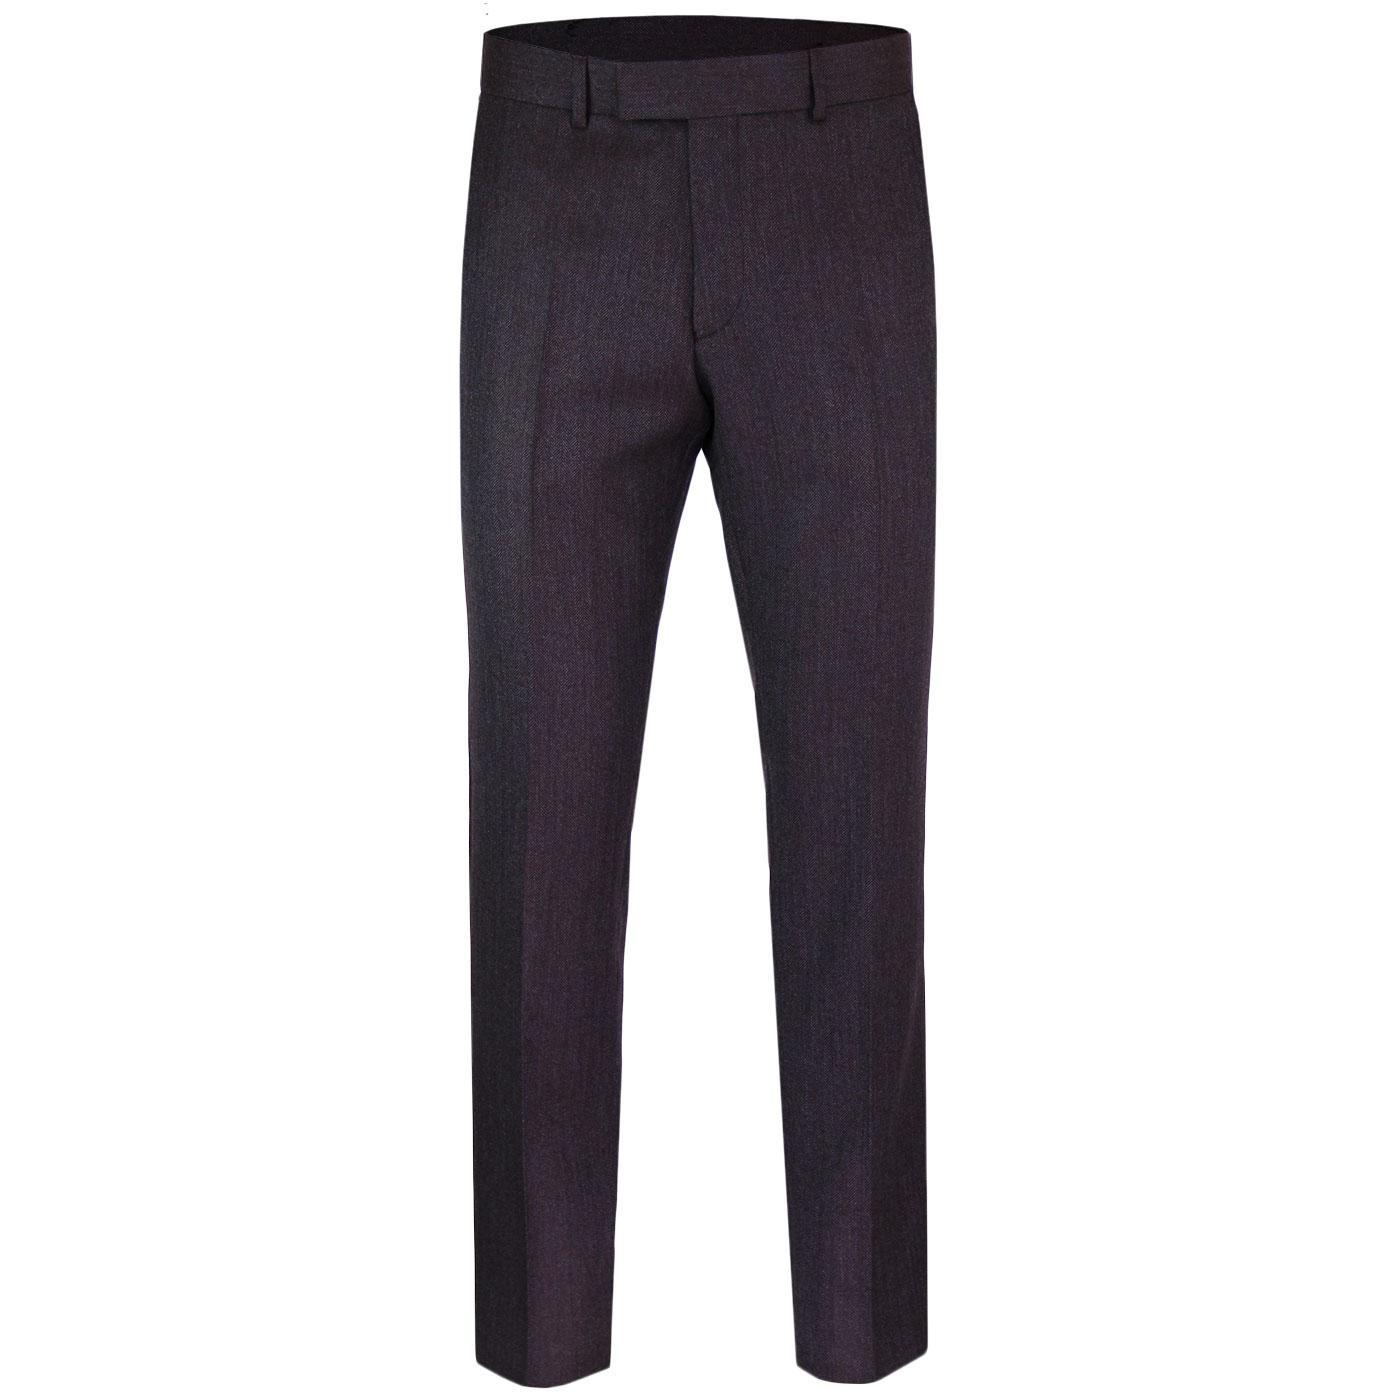 Radisson GIBSON LONDON Herringbone Tonic Trousers